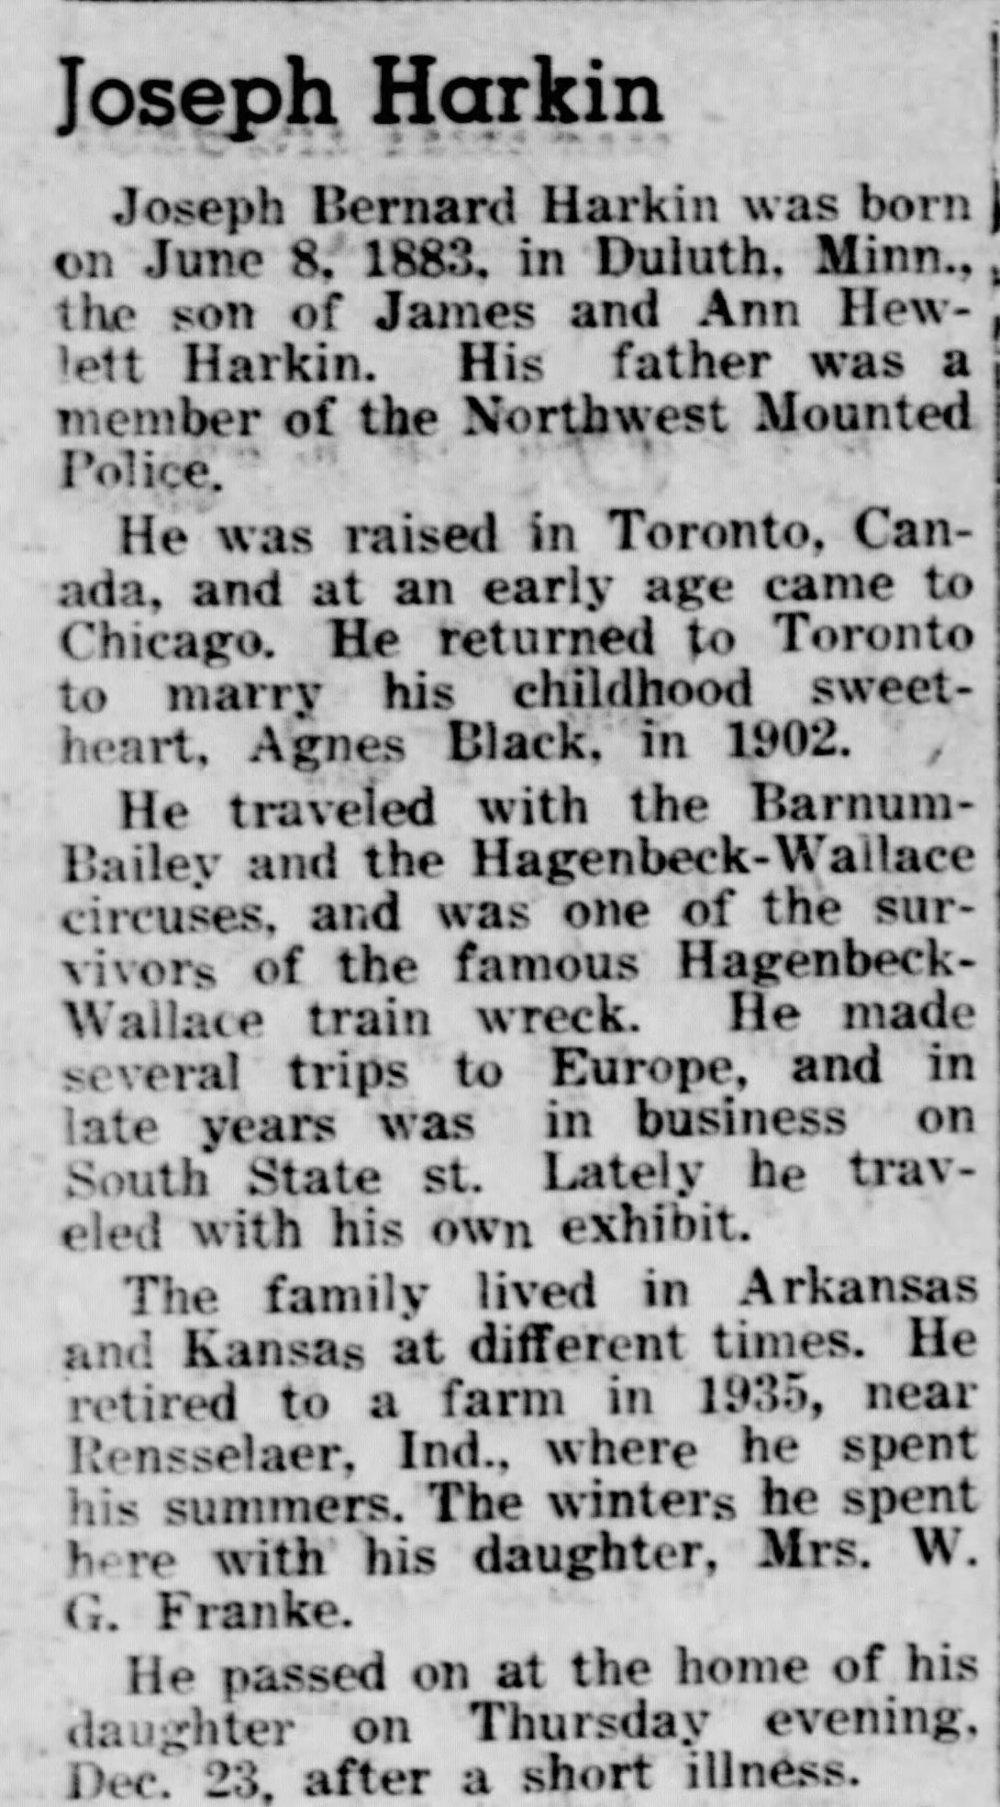 Obituary for Joseph Bernard Harkin,  Arlington Heights Herald , December 31, 1943.